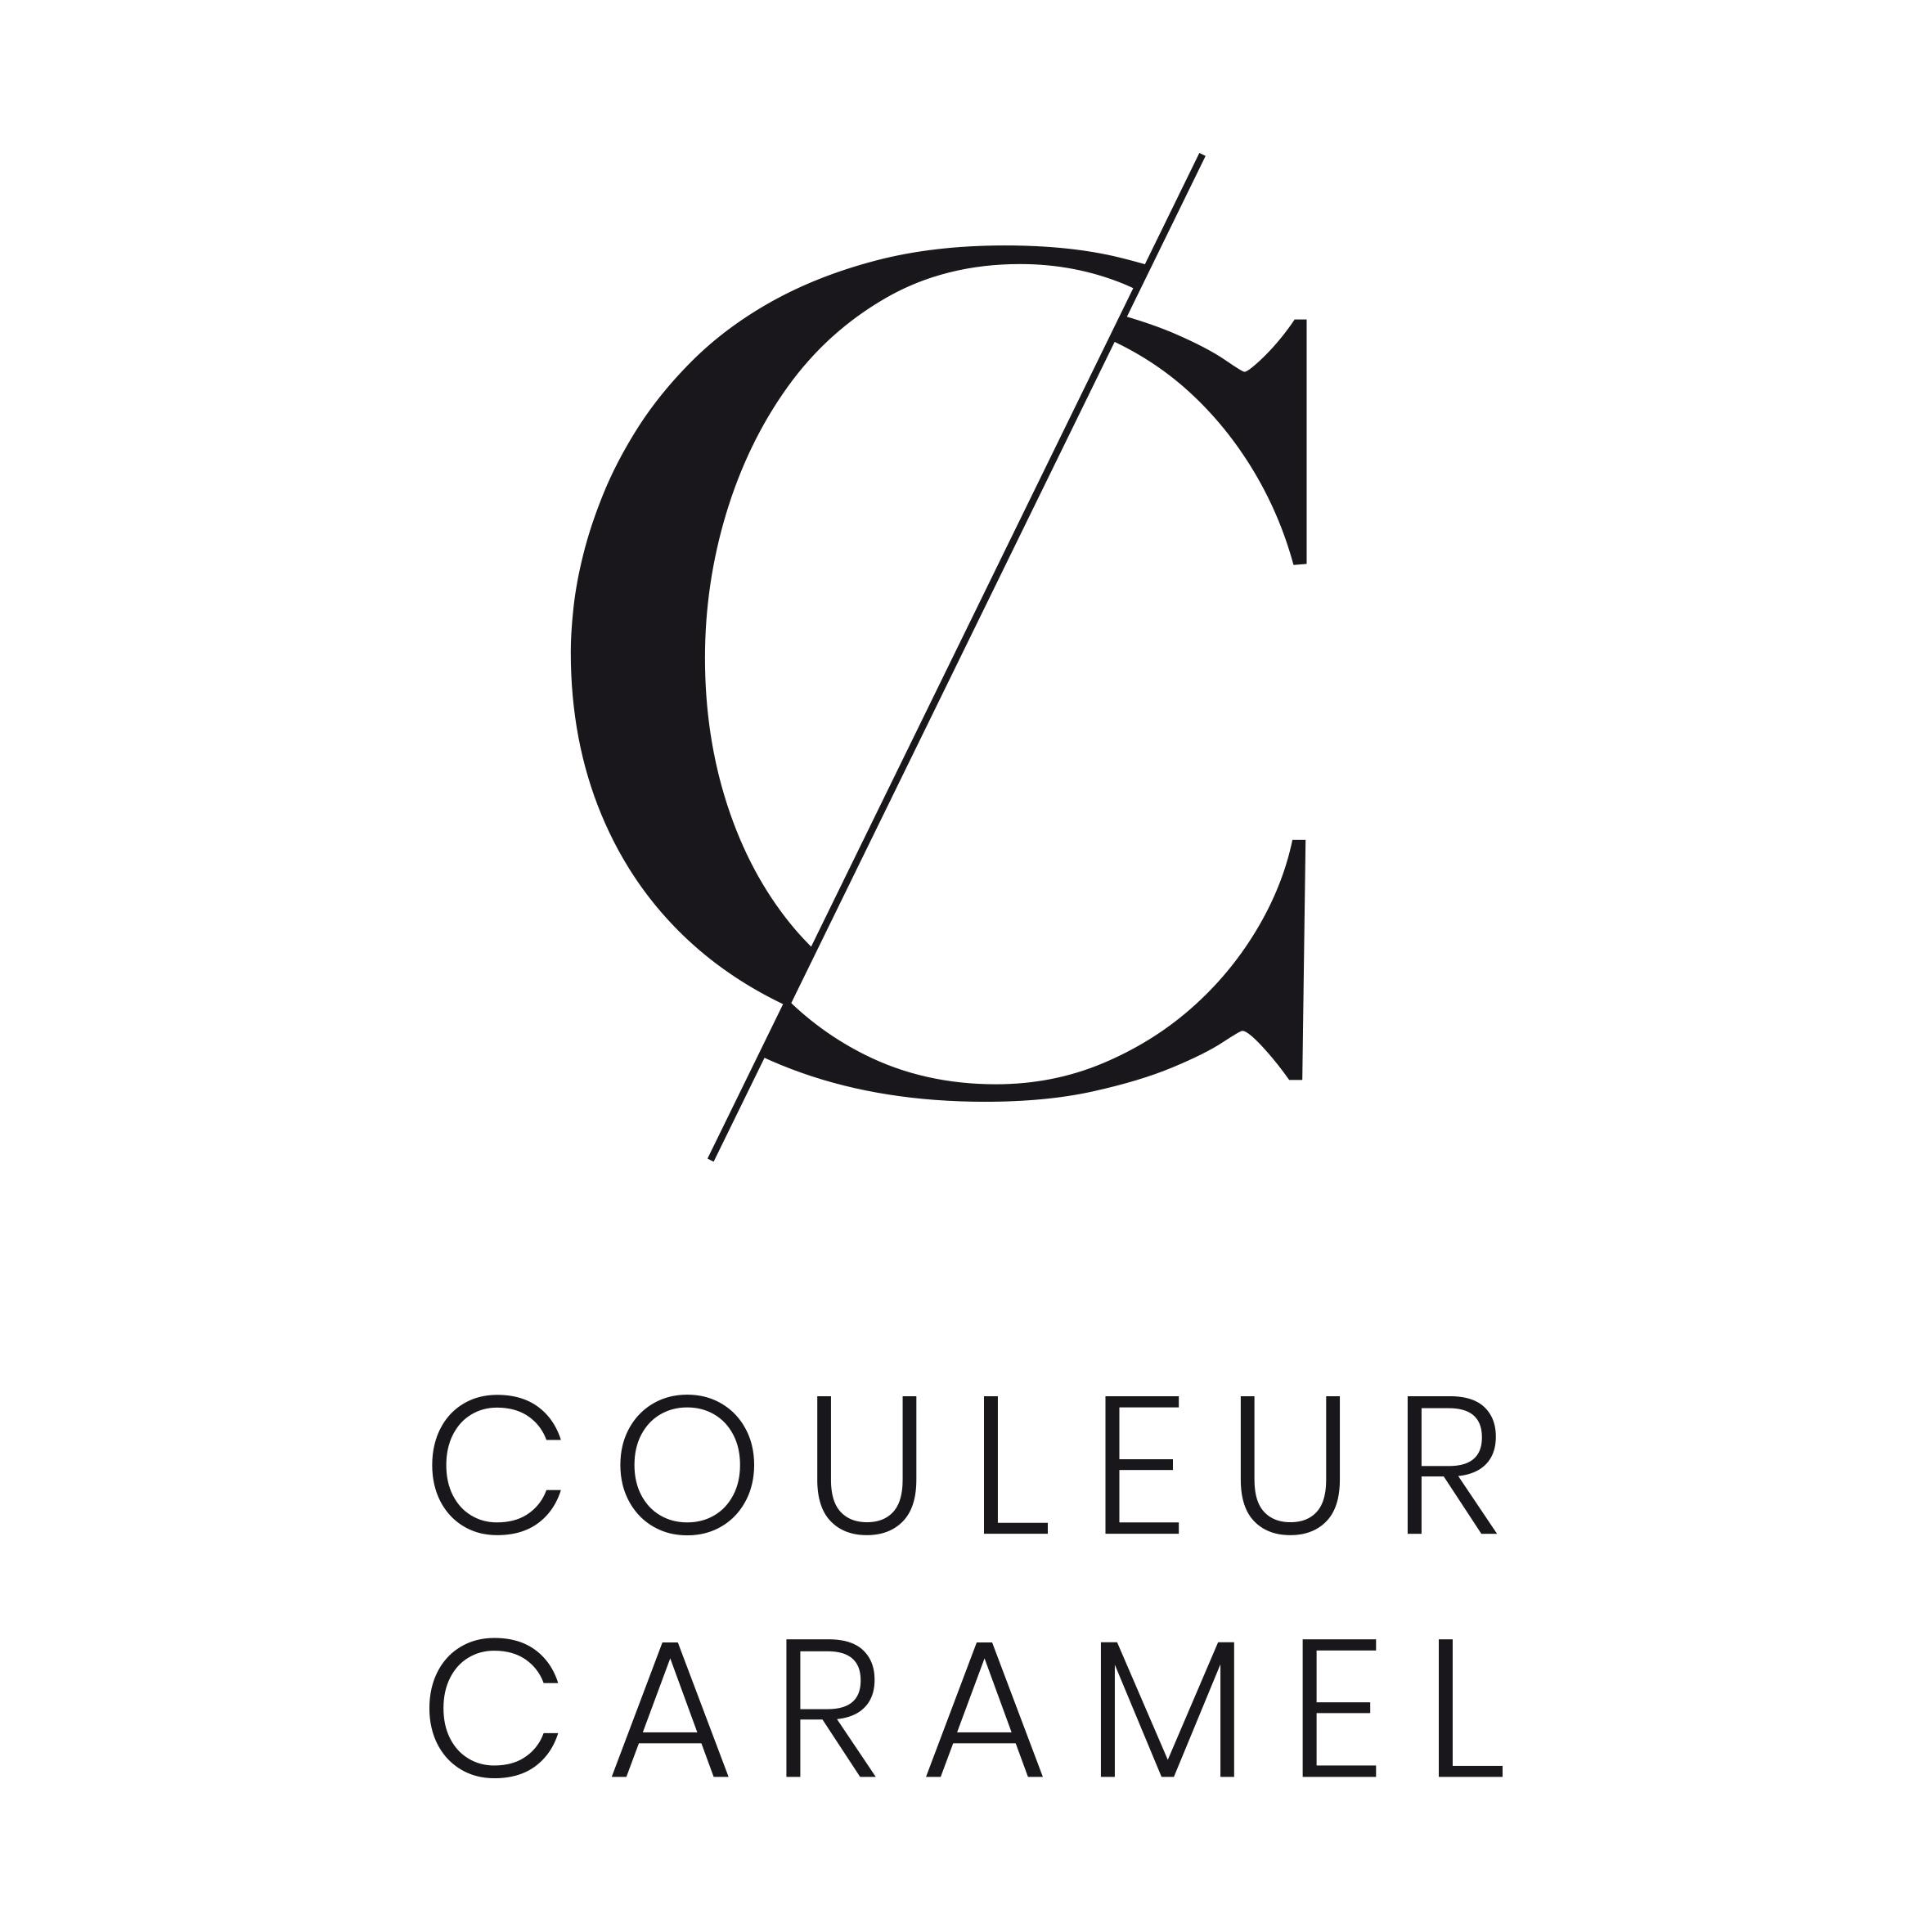 couleur-caramel-logo